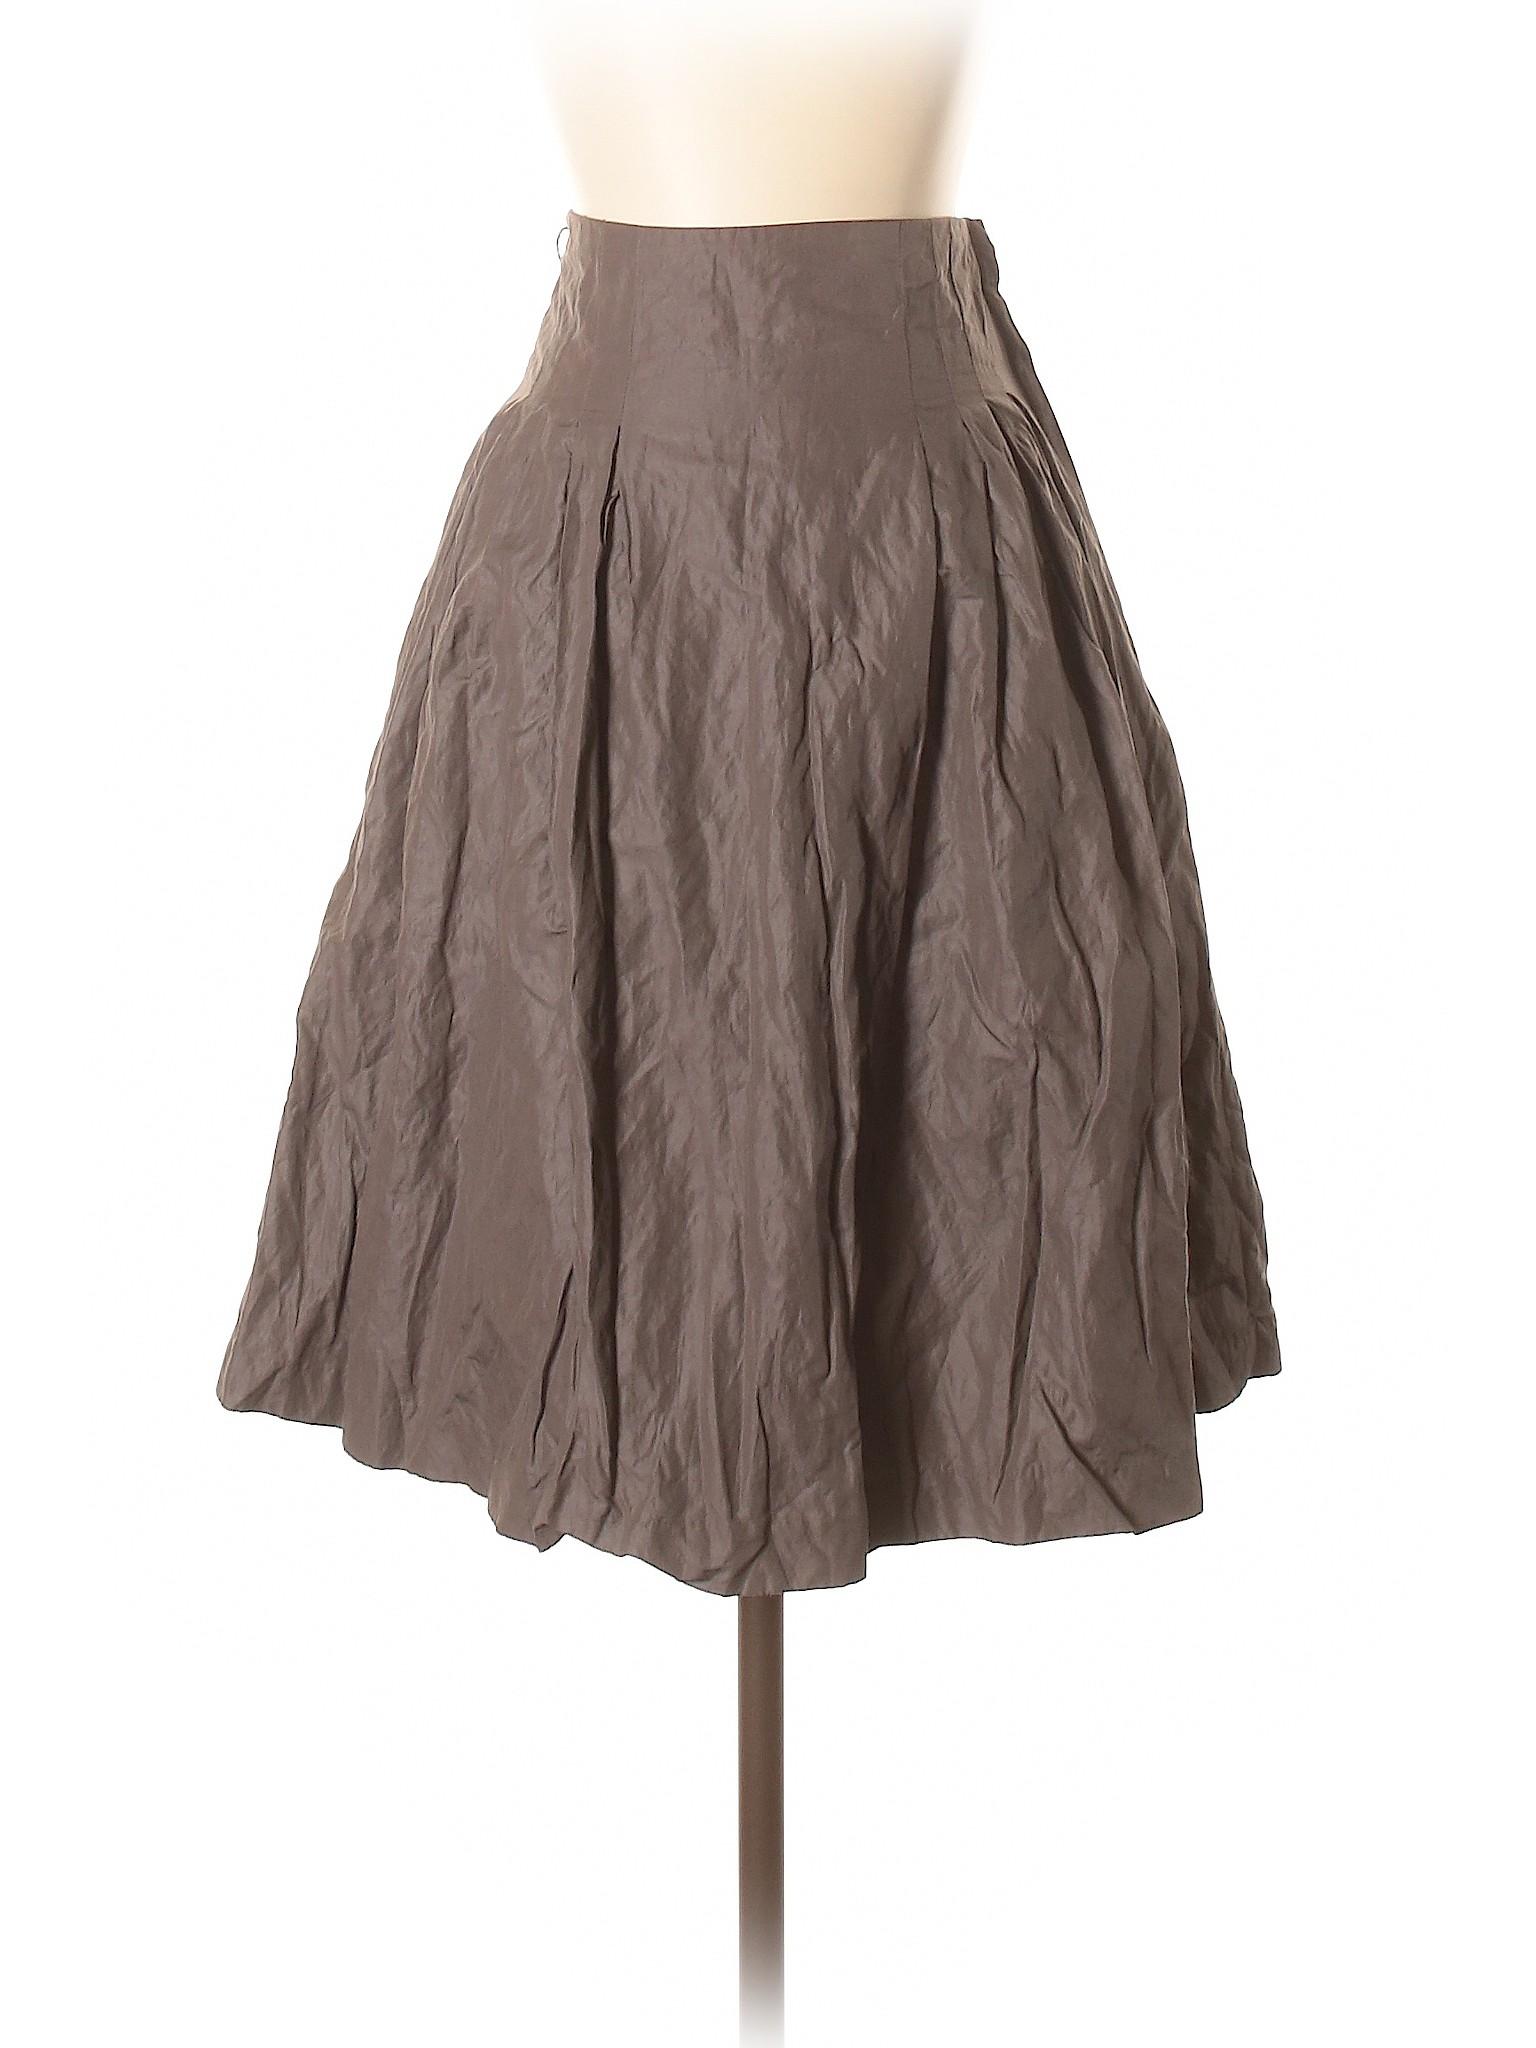 Boutique Boutique Skirt Casual Boutique Skirt Casual Skirt Casual Boutique HxzvrHY